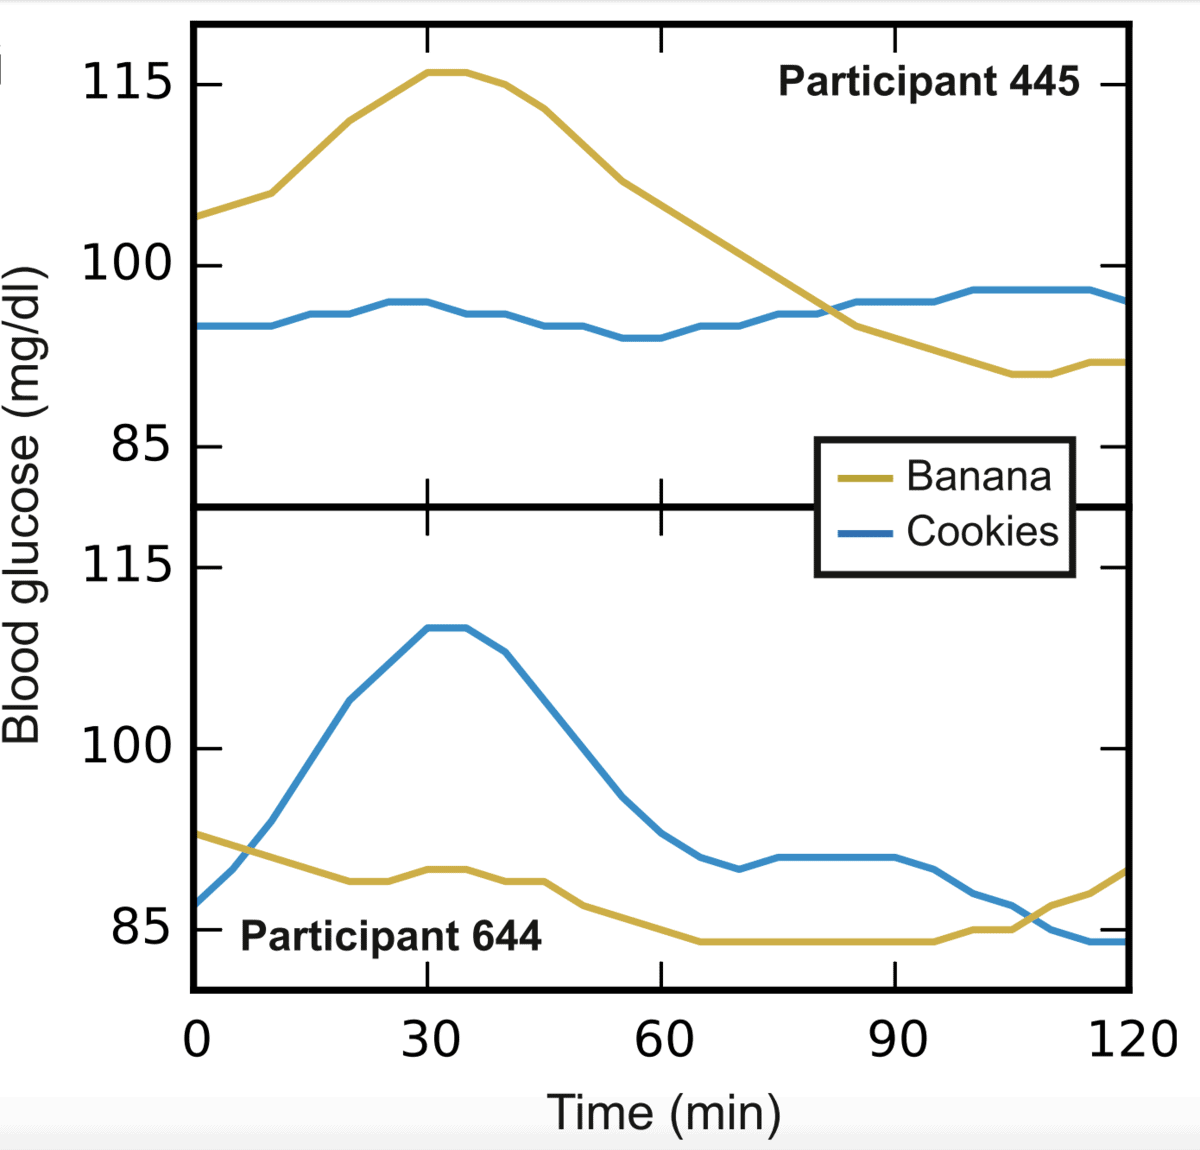 Glucose tolerance & carb tolerance variation between people